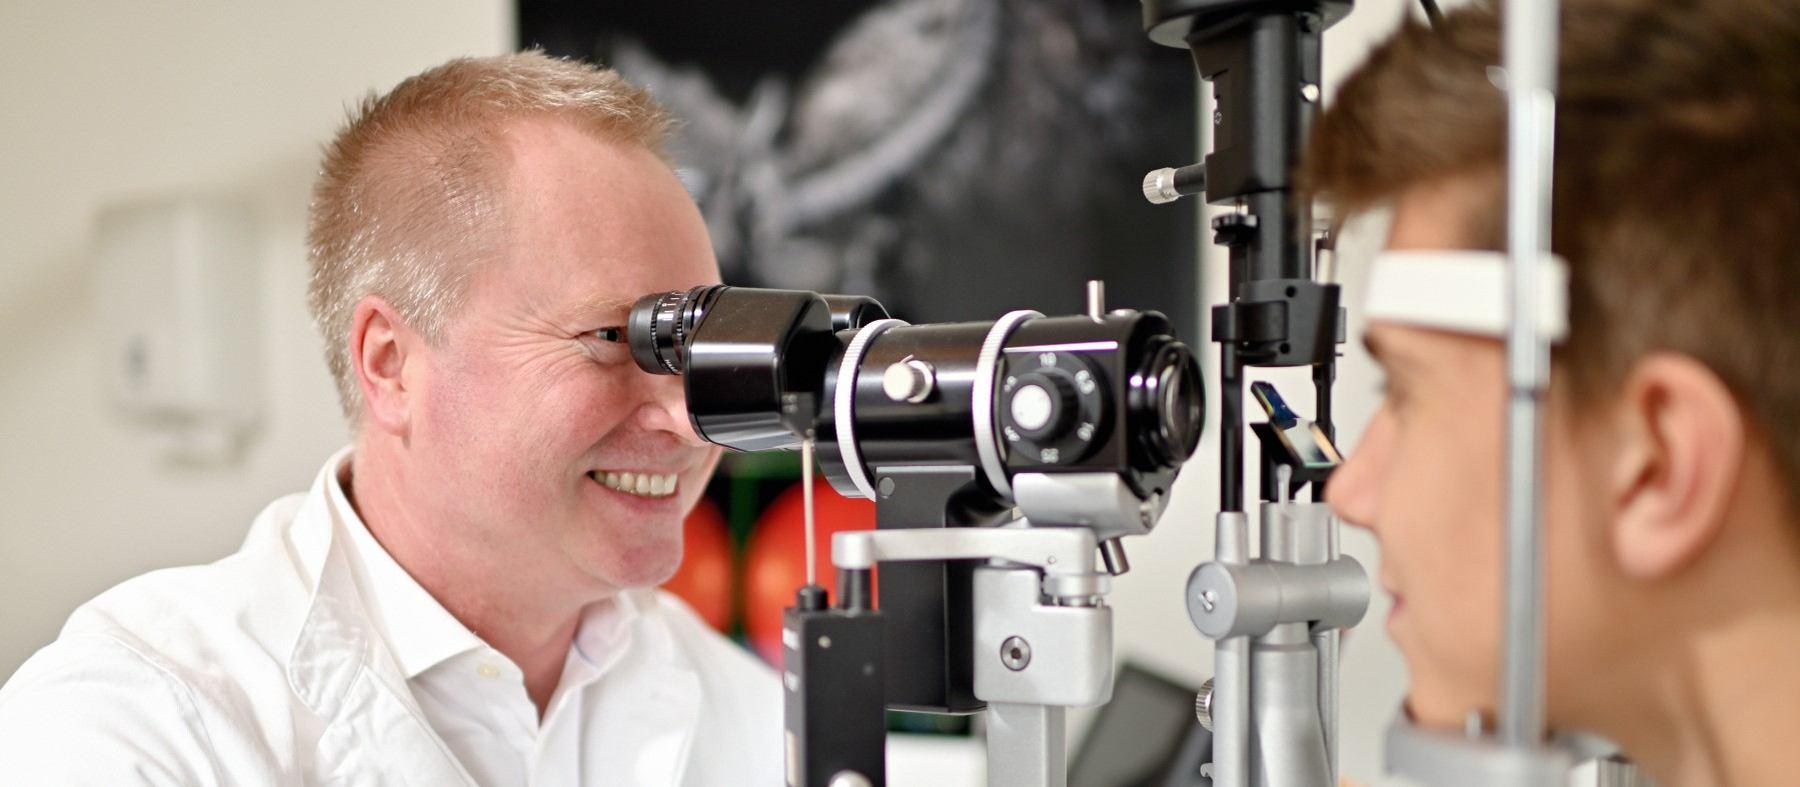 Augenarzt_Gandorfer_1